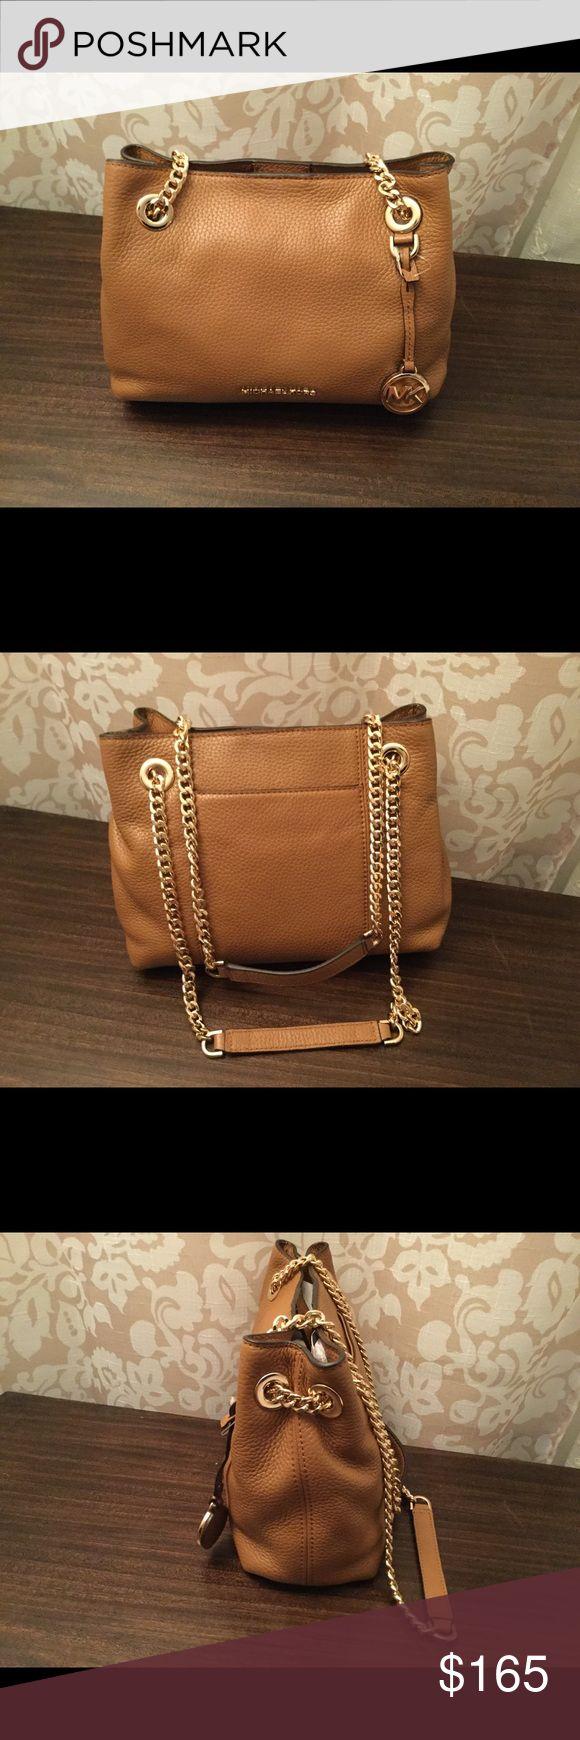 "Michael Kors jet set chain handbag Michael Kors jet set chain handbag.                      Dimensions 9-7/8""W x 7-1/8""H x 4""D Michael Kors Bags Shoulder Bags"